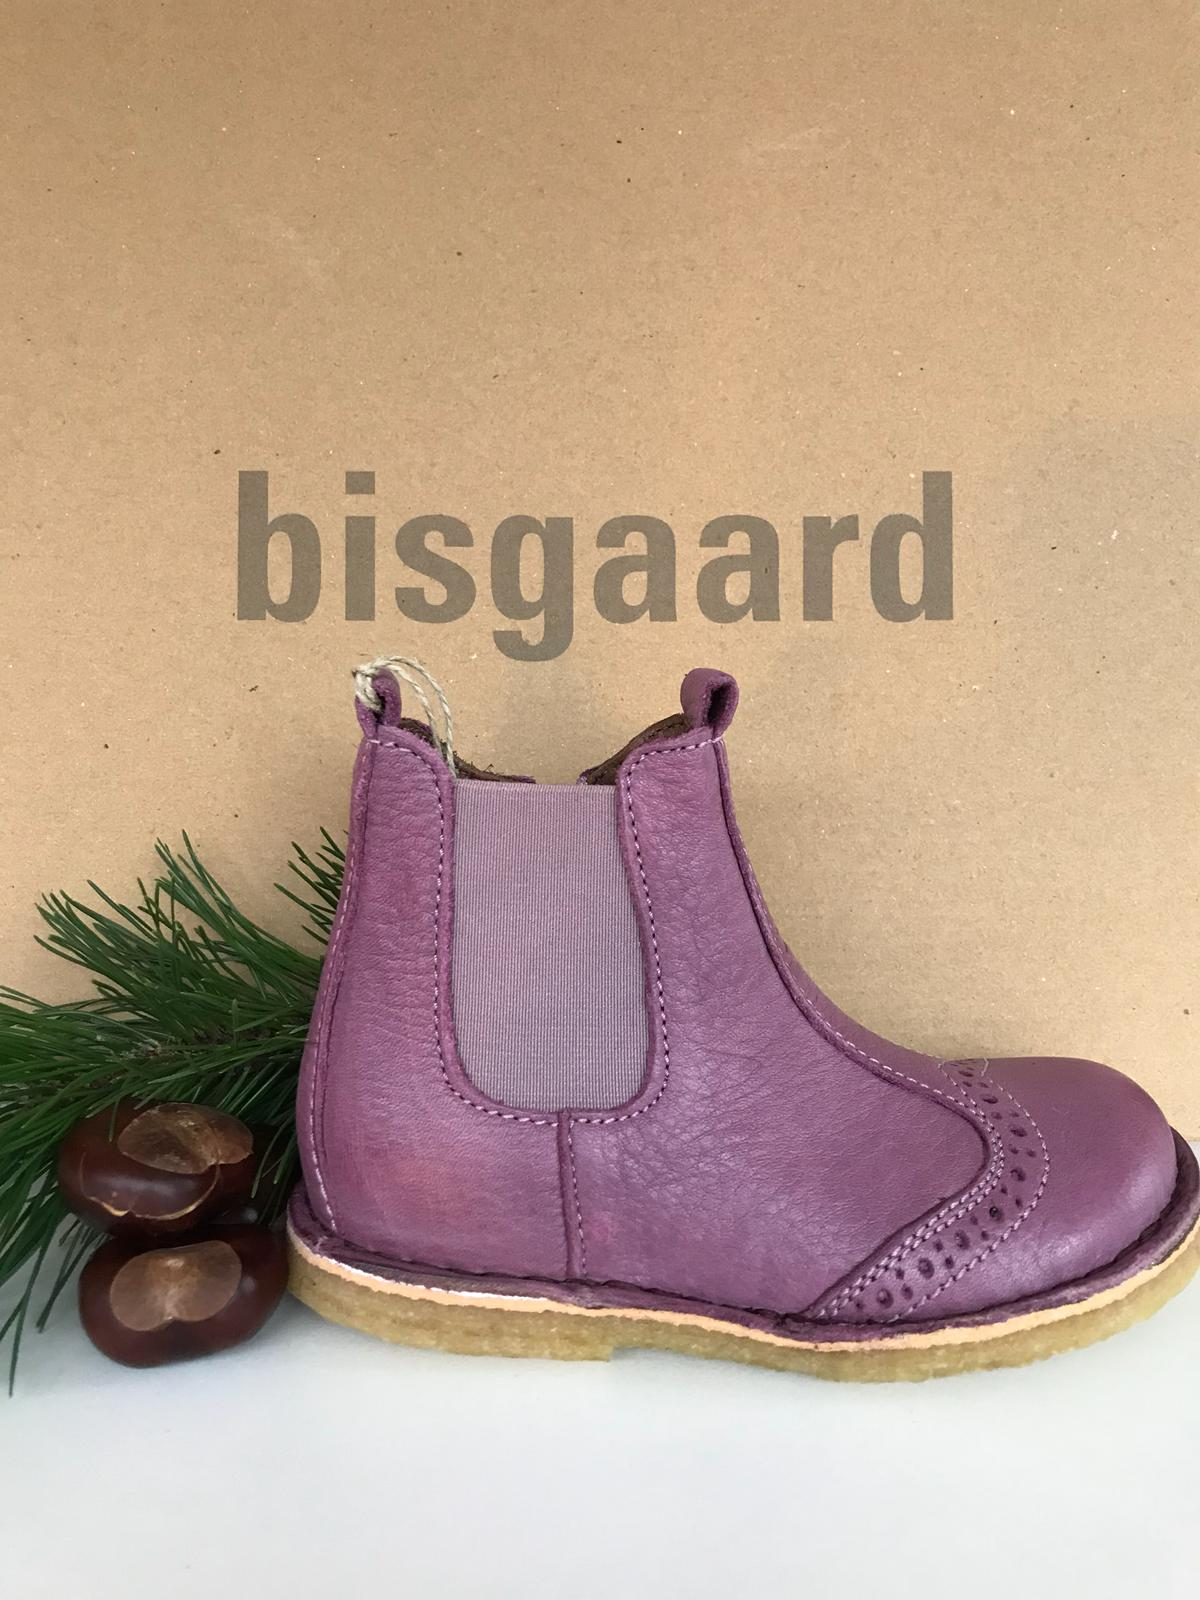 bisgaard-10-2018-02